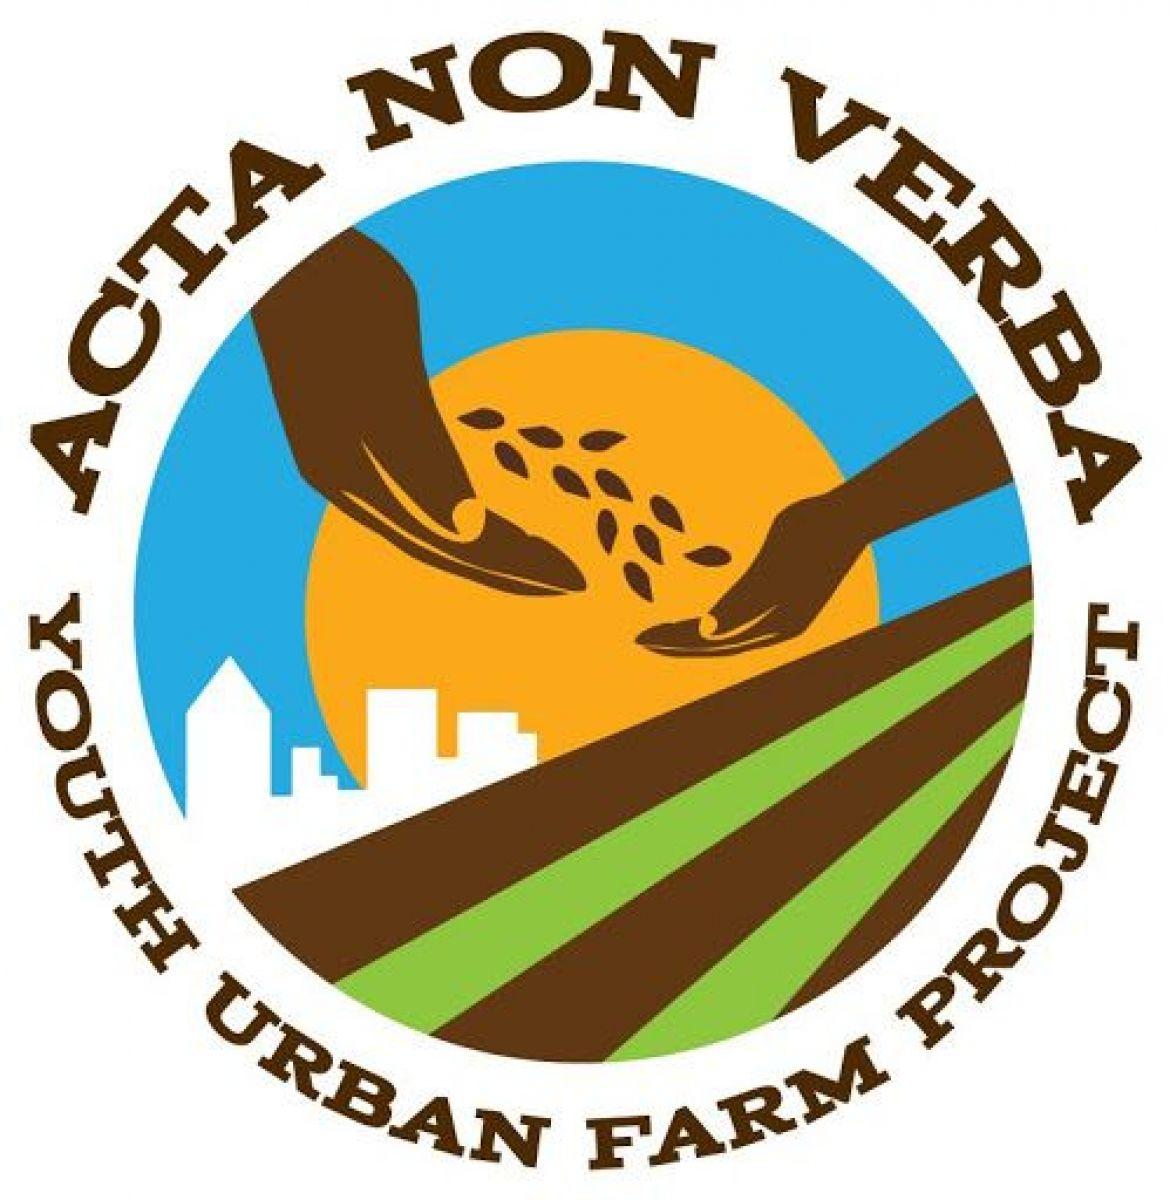 actanonverba_logo.jpg